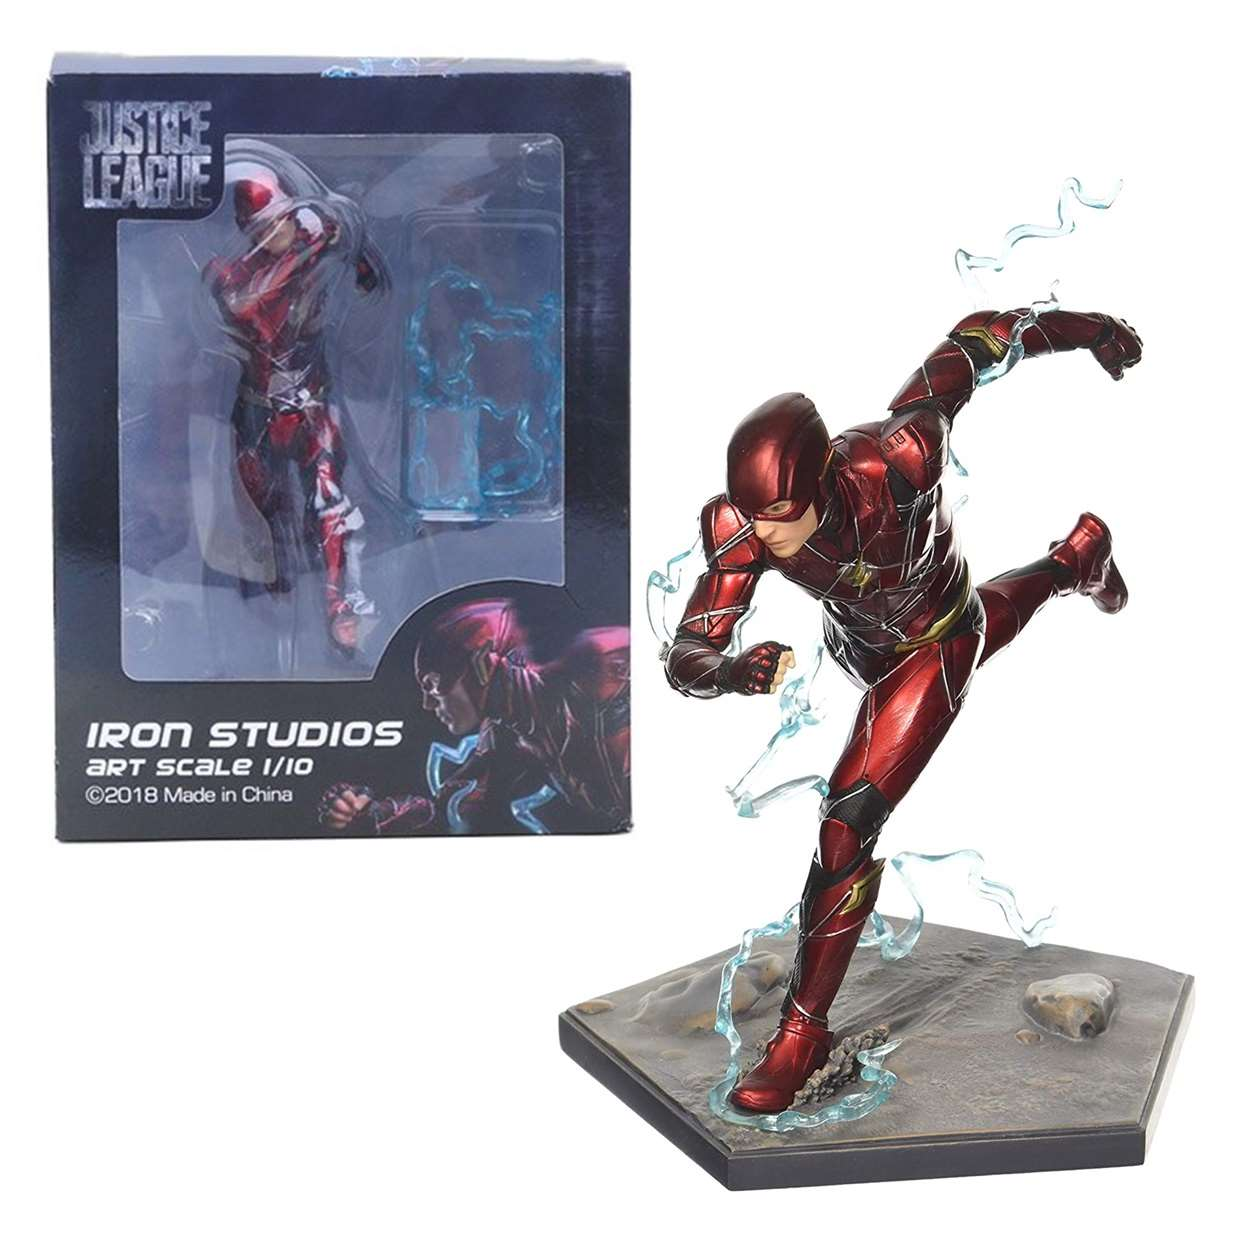 The Flash Running Art Escale 1/10 Estatua Justice League